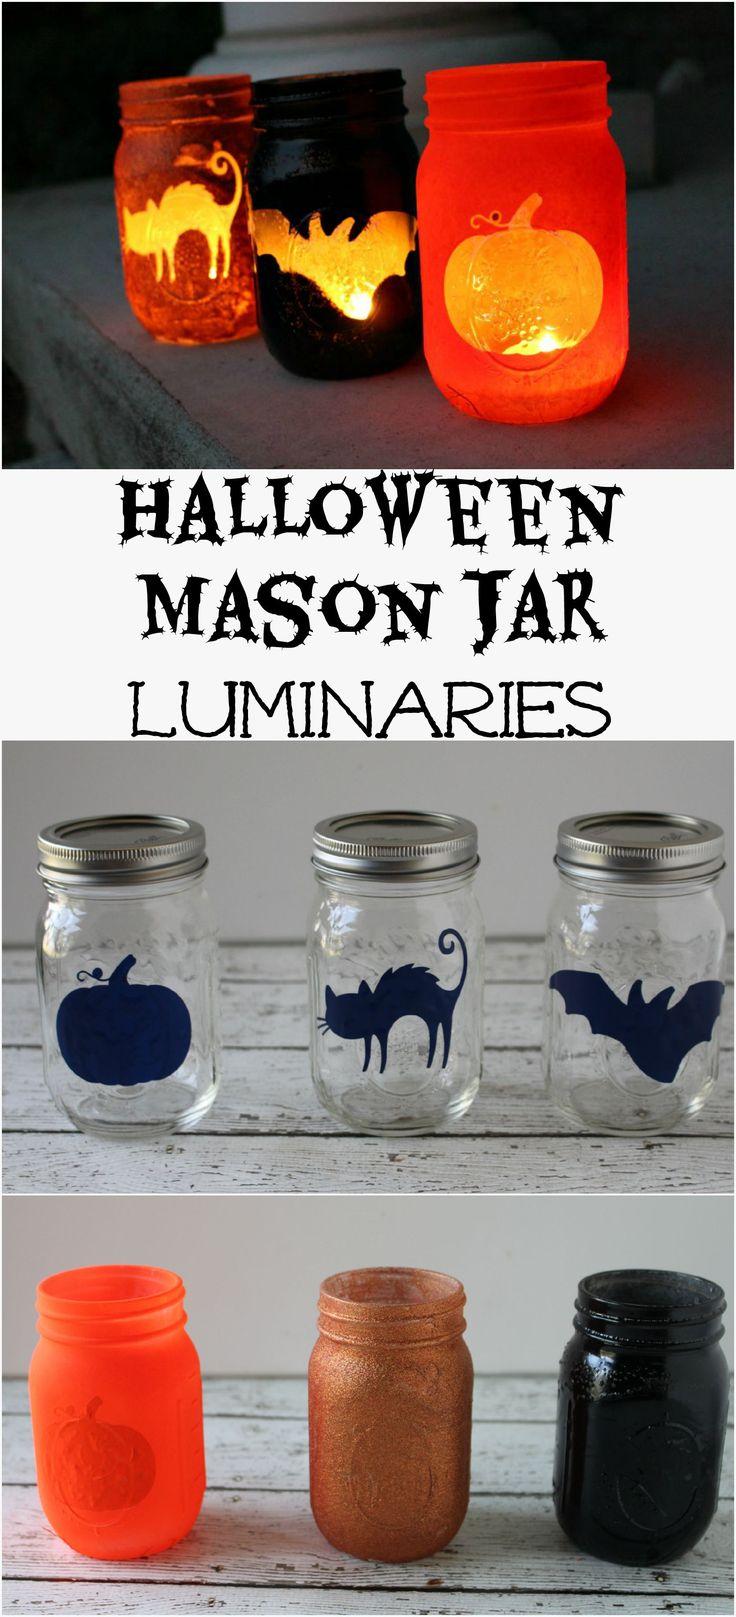 Halloween Mason Jar Luminaries - The EASIEST Halloween decoration EVER!!!